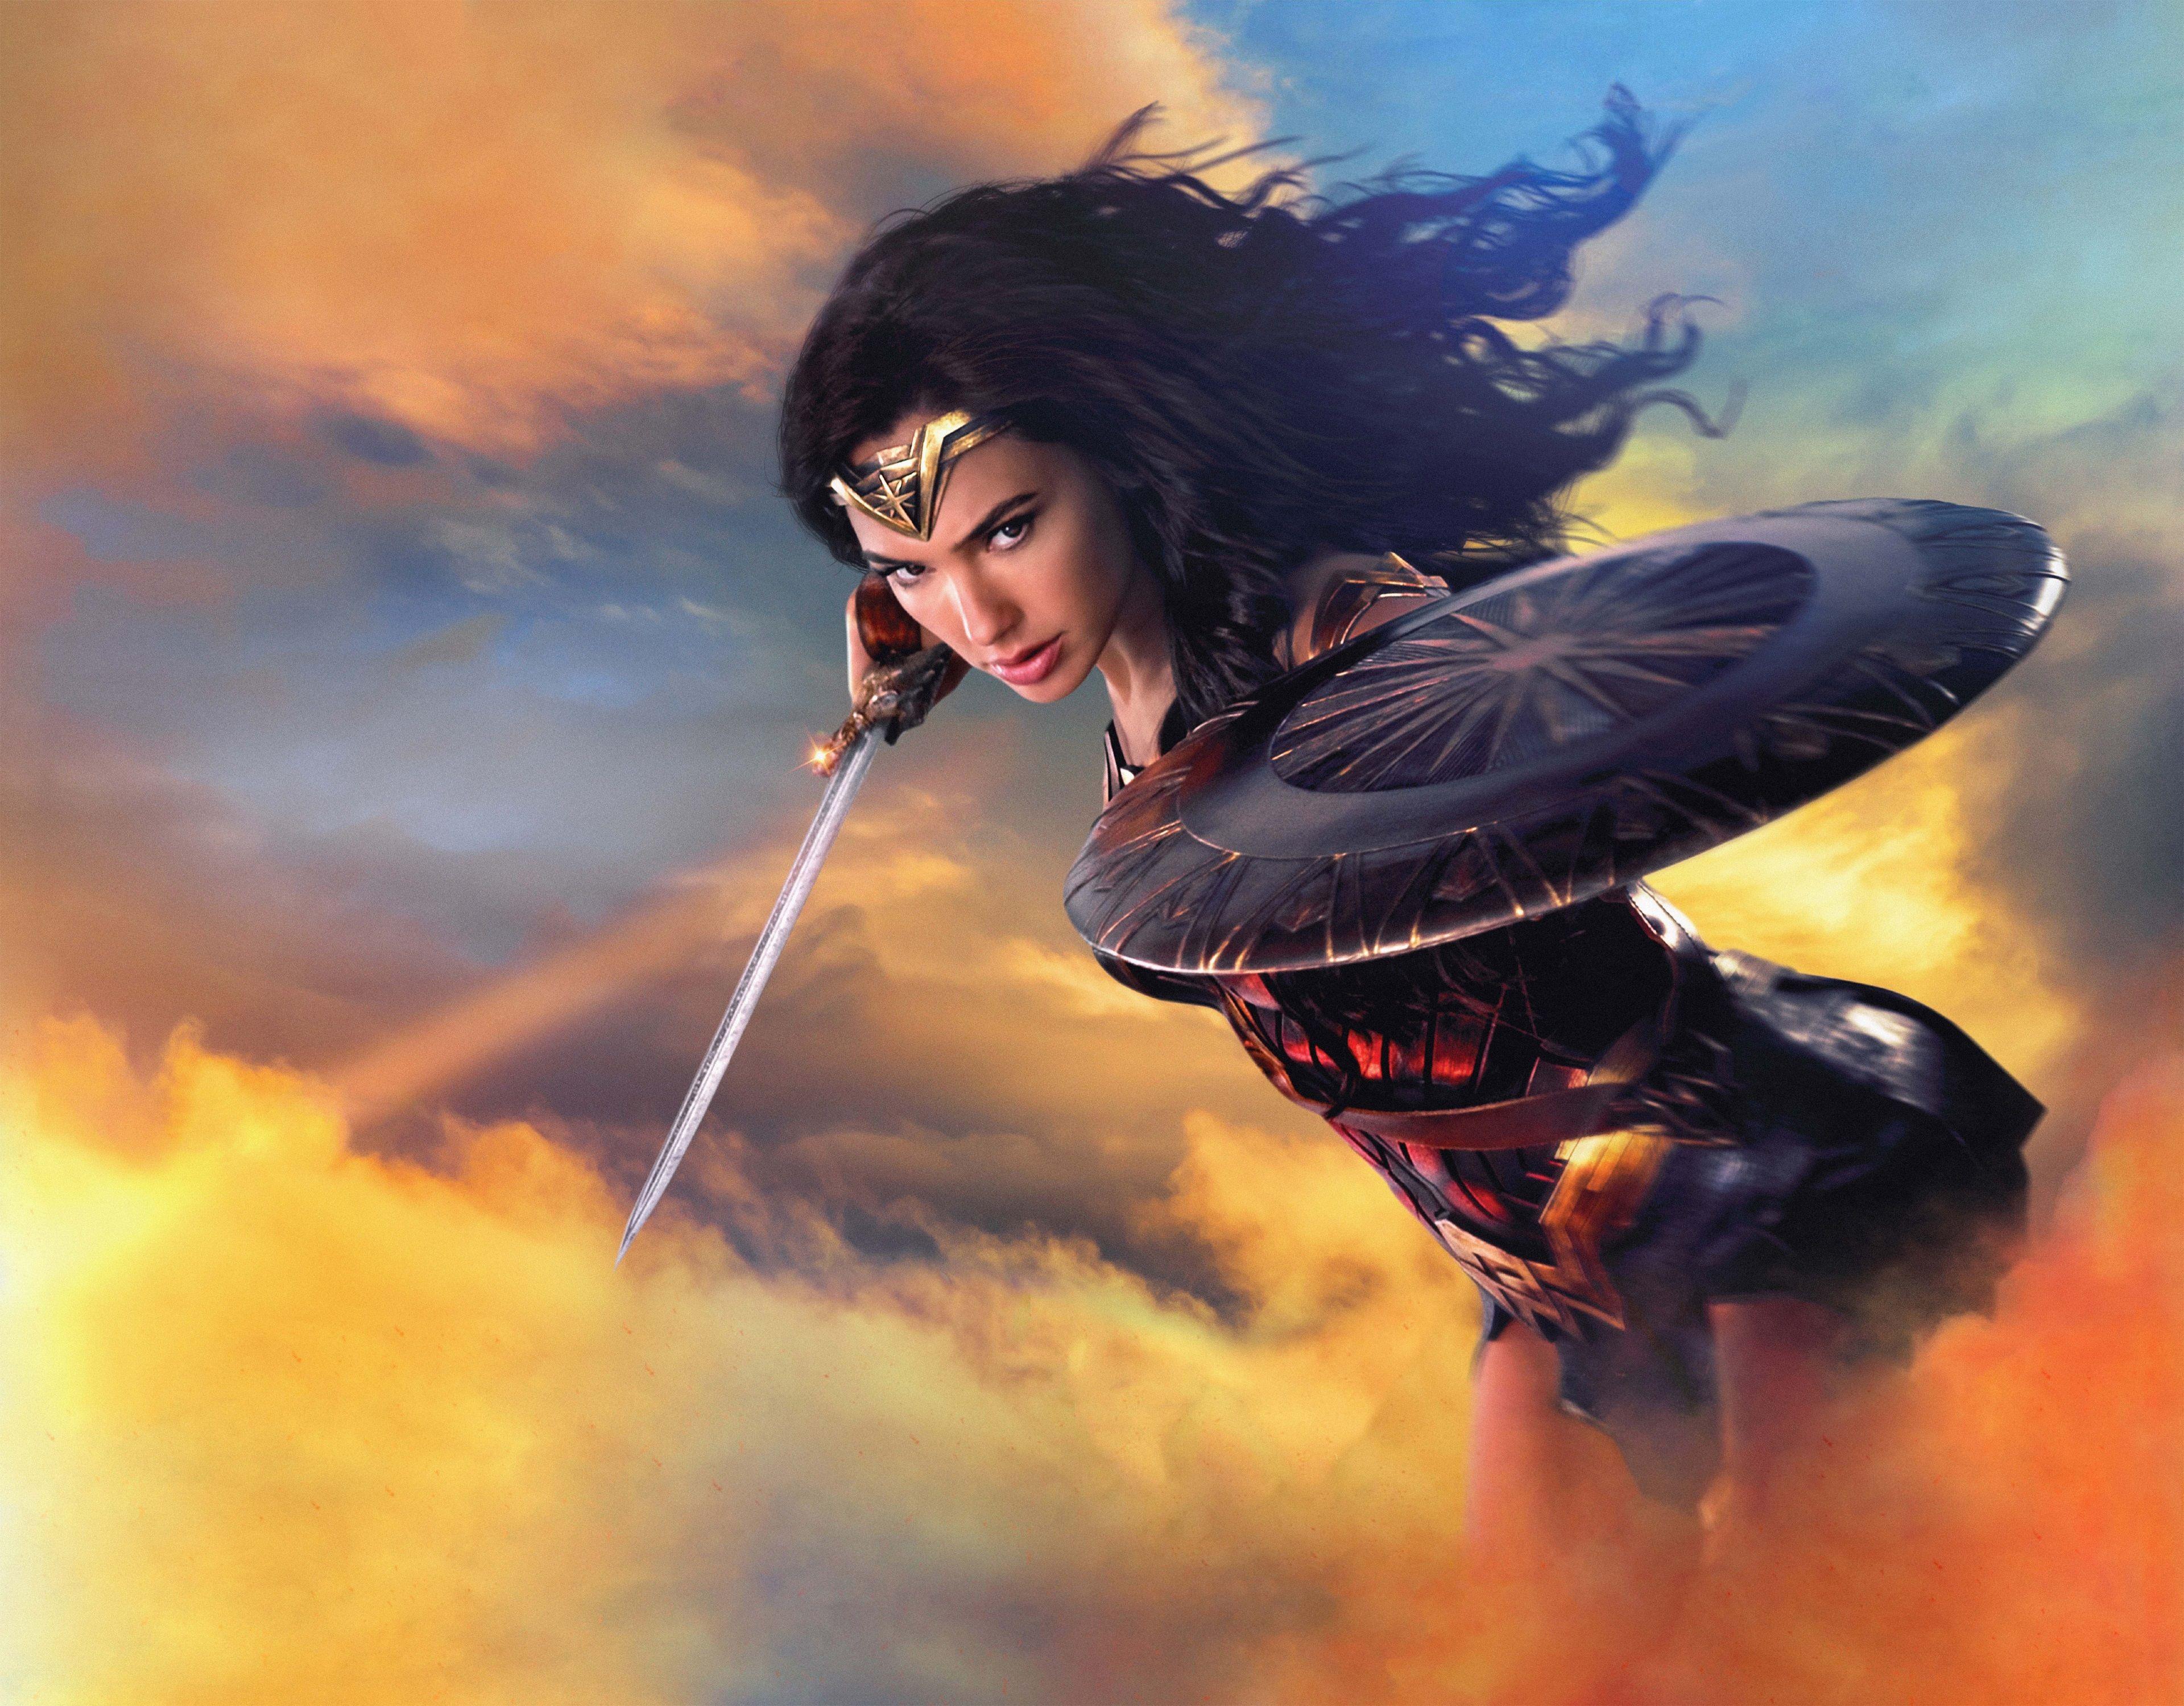 3840x3000 Wonder Woman 4k Wallpaper Pc In 2020 Wonder Woman Movie Wonder Woman Wonder Woman Aesthetic